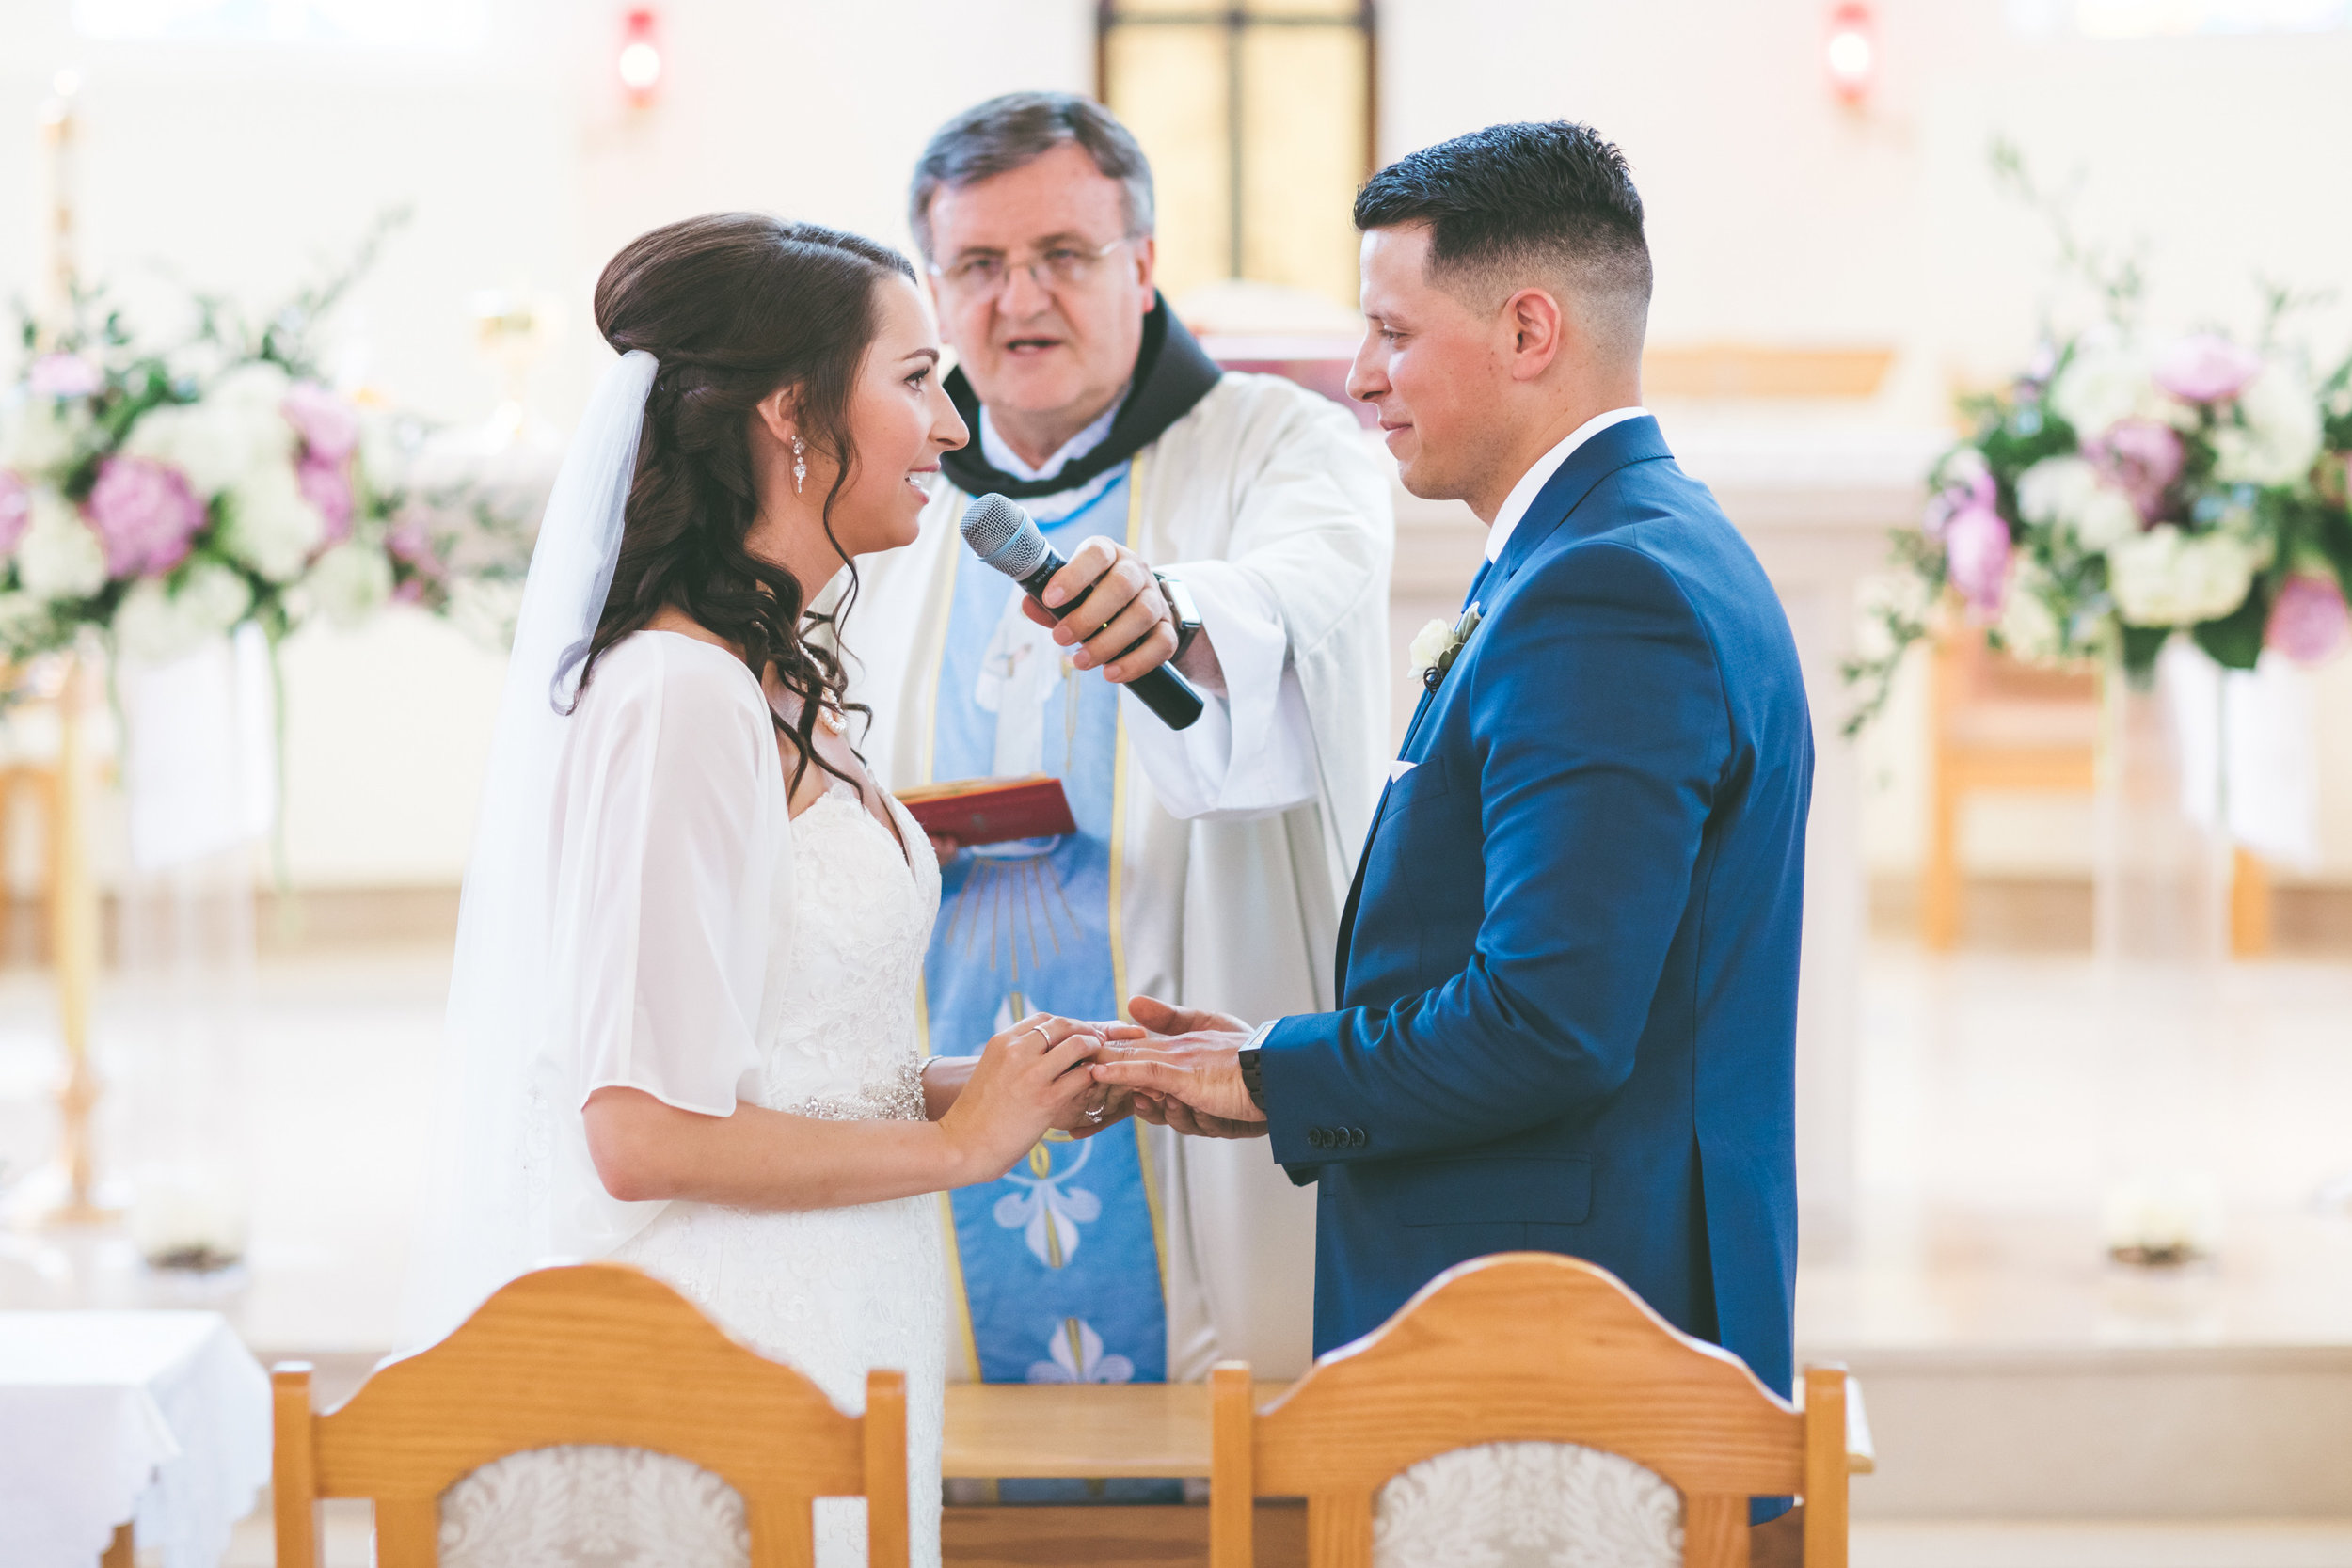 ashley___dario_wedding___lifesreel_danielcaruso___0810.jpg